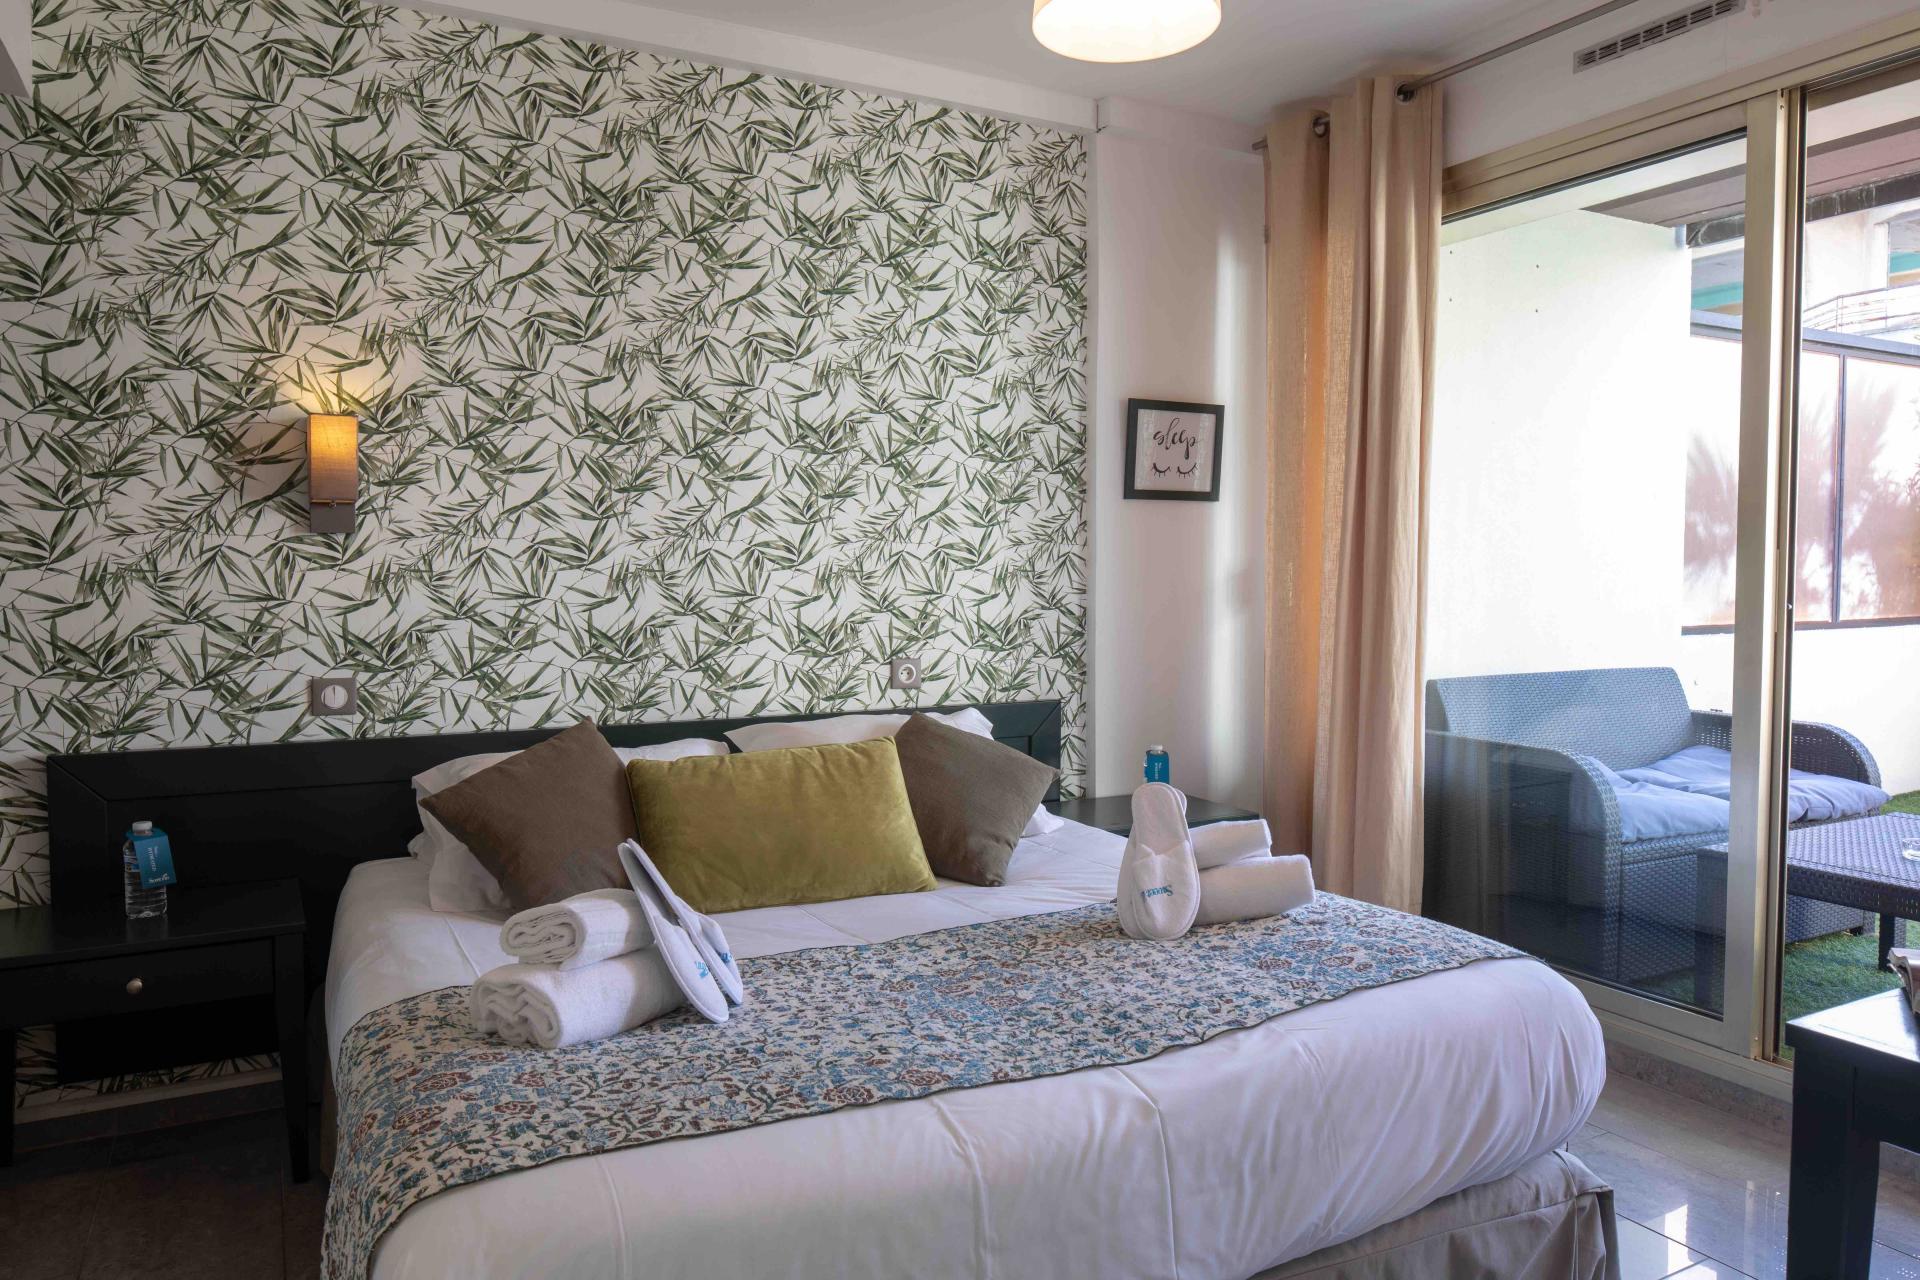 Deluxe bedroom at Avenue Alexandre Apartments, Juan-les-Pins, Antibes